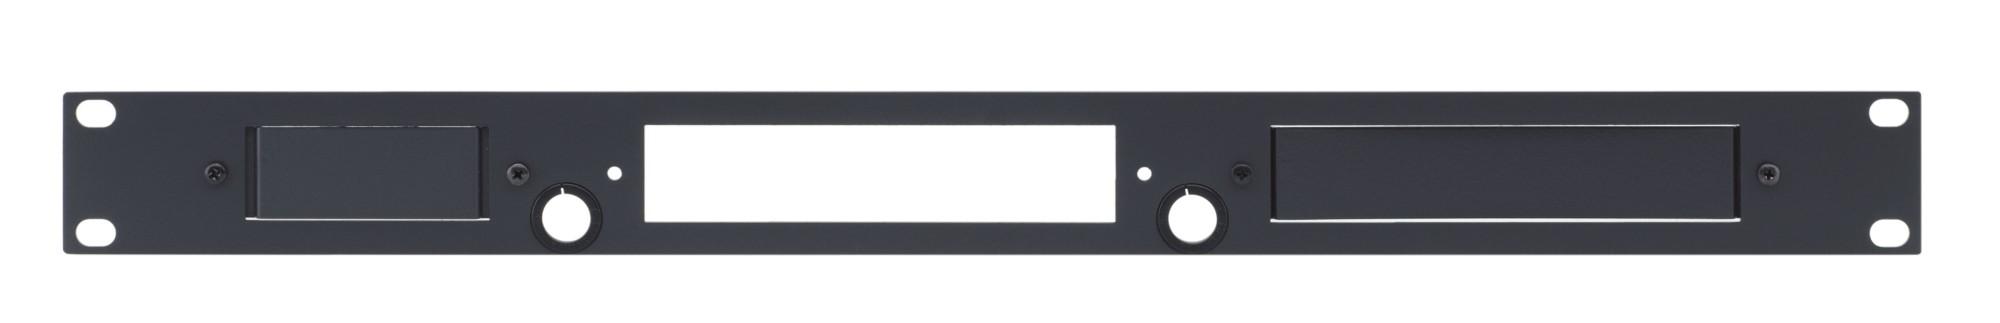 Kramer Electronics RK-2T1PT rack accessory